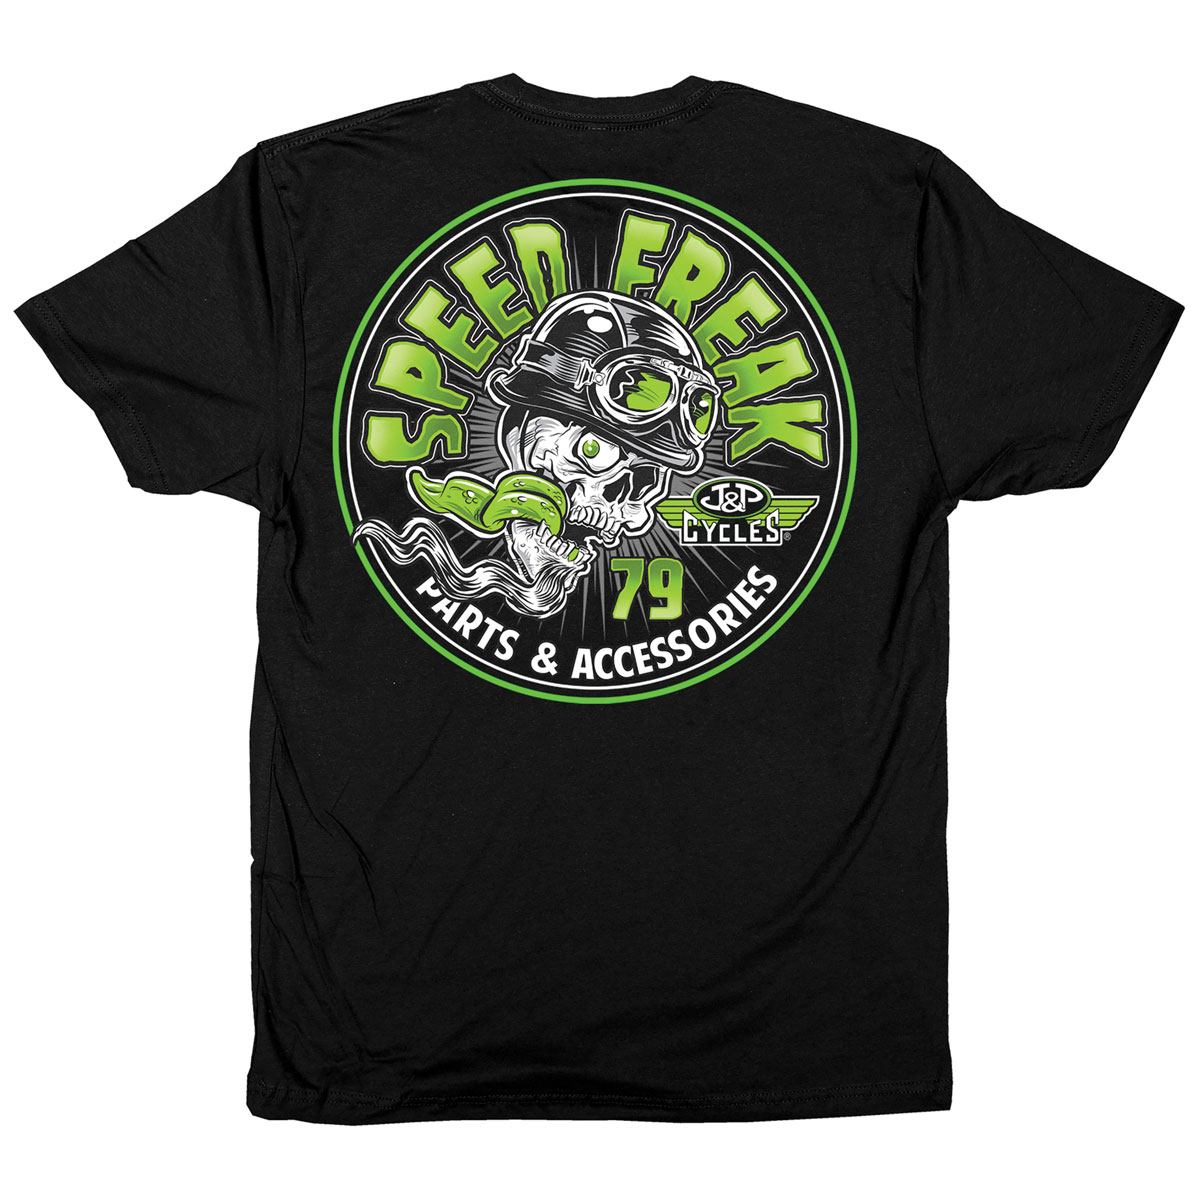 J&P Cycles Men's Speed Freak Black T-Shirt